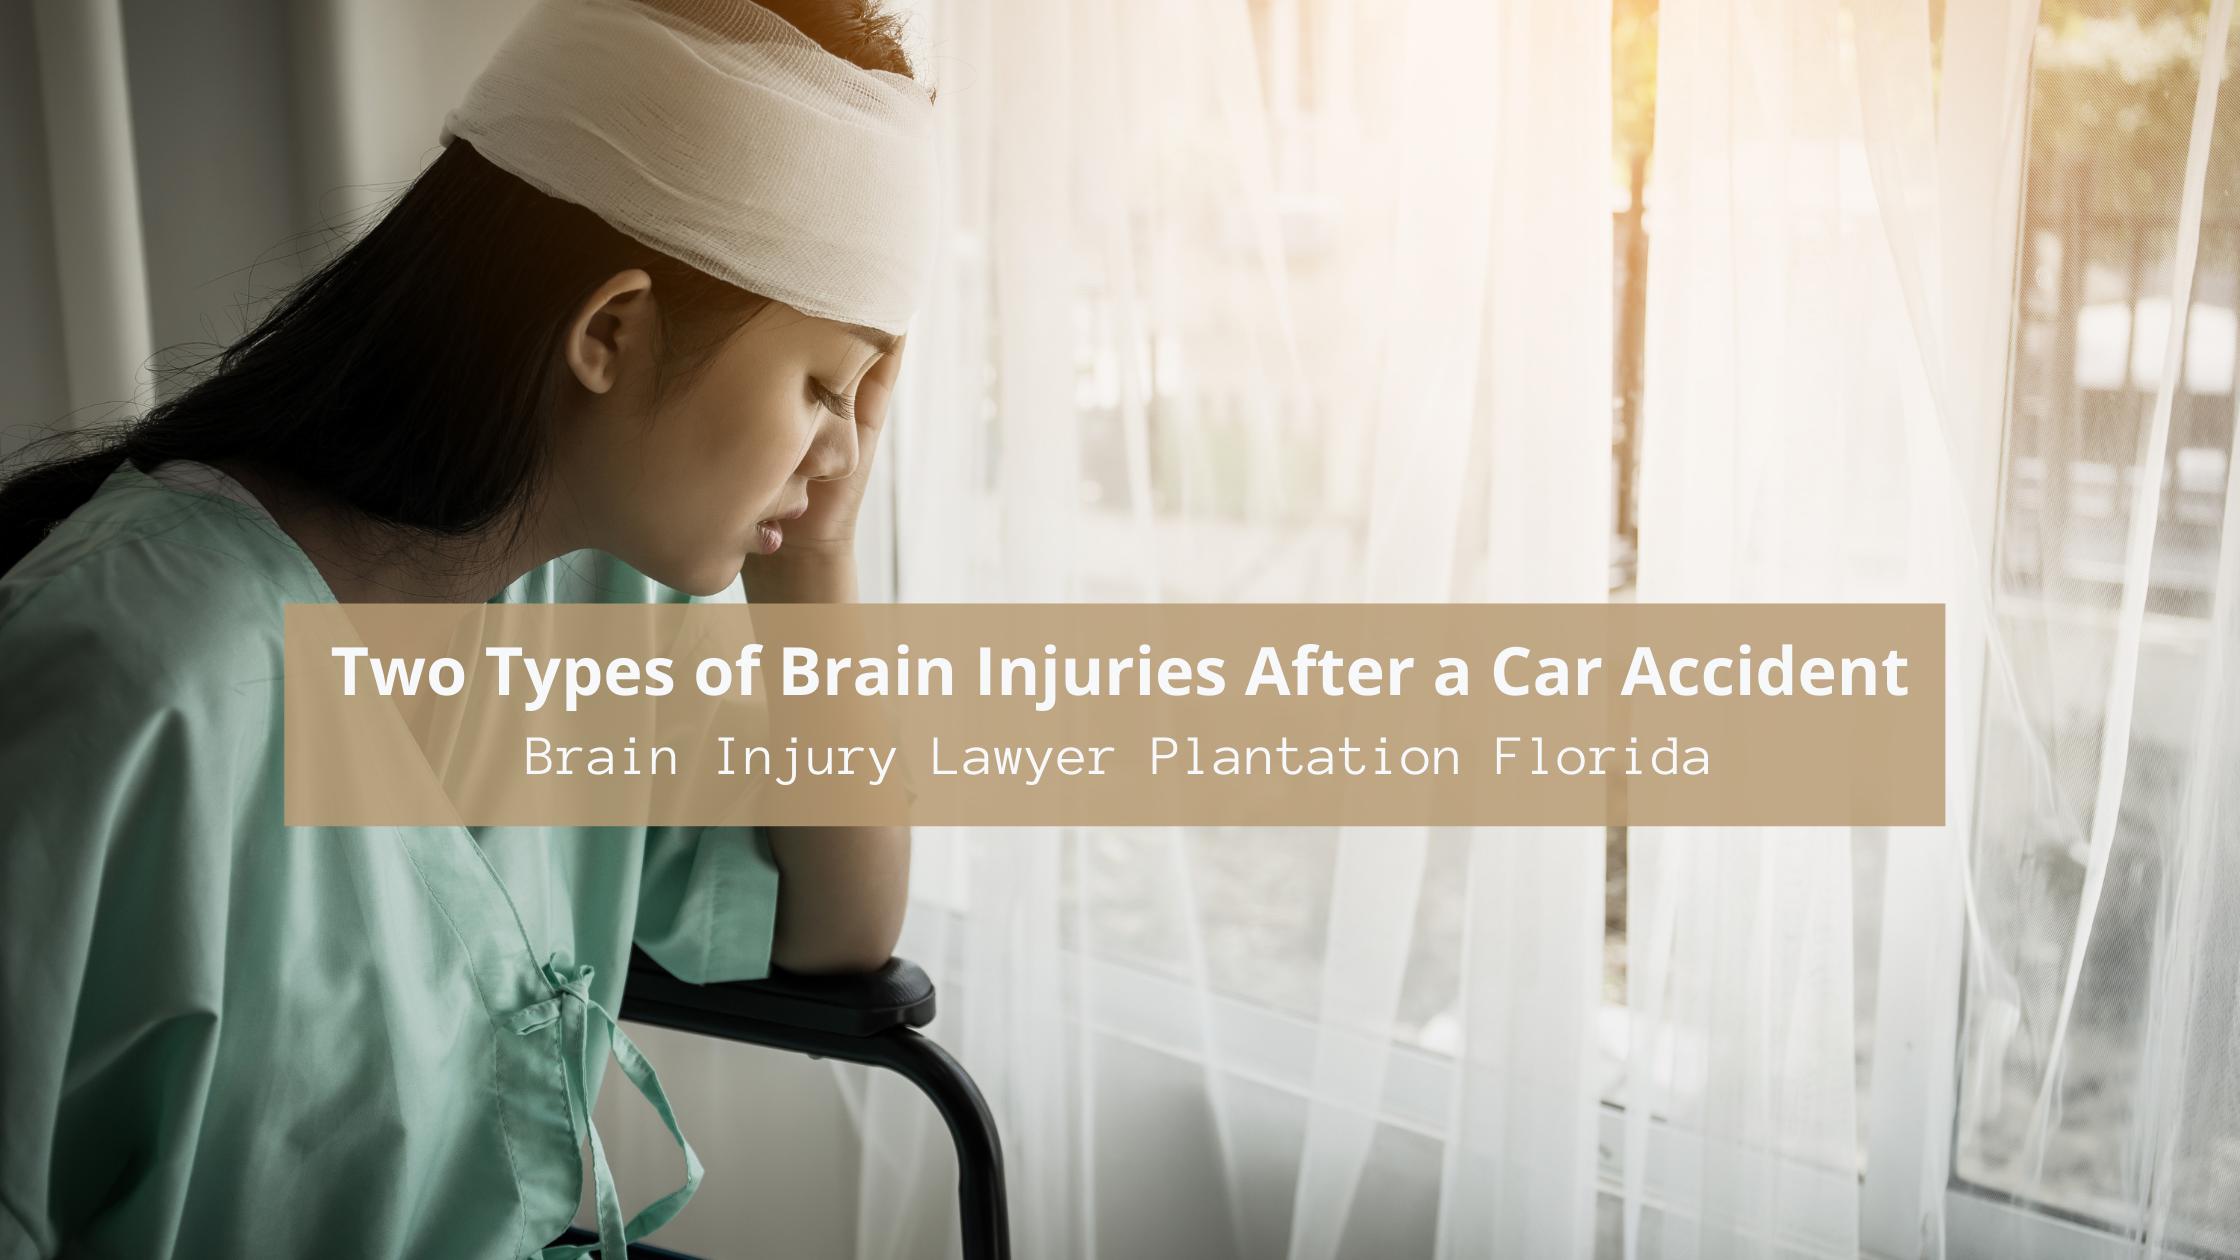 Brain Injury Lawyer Plantation Florida